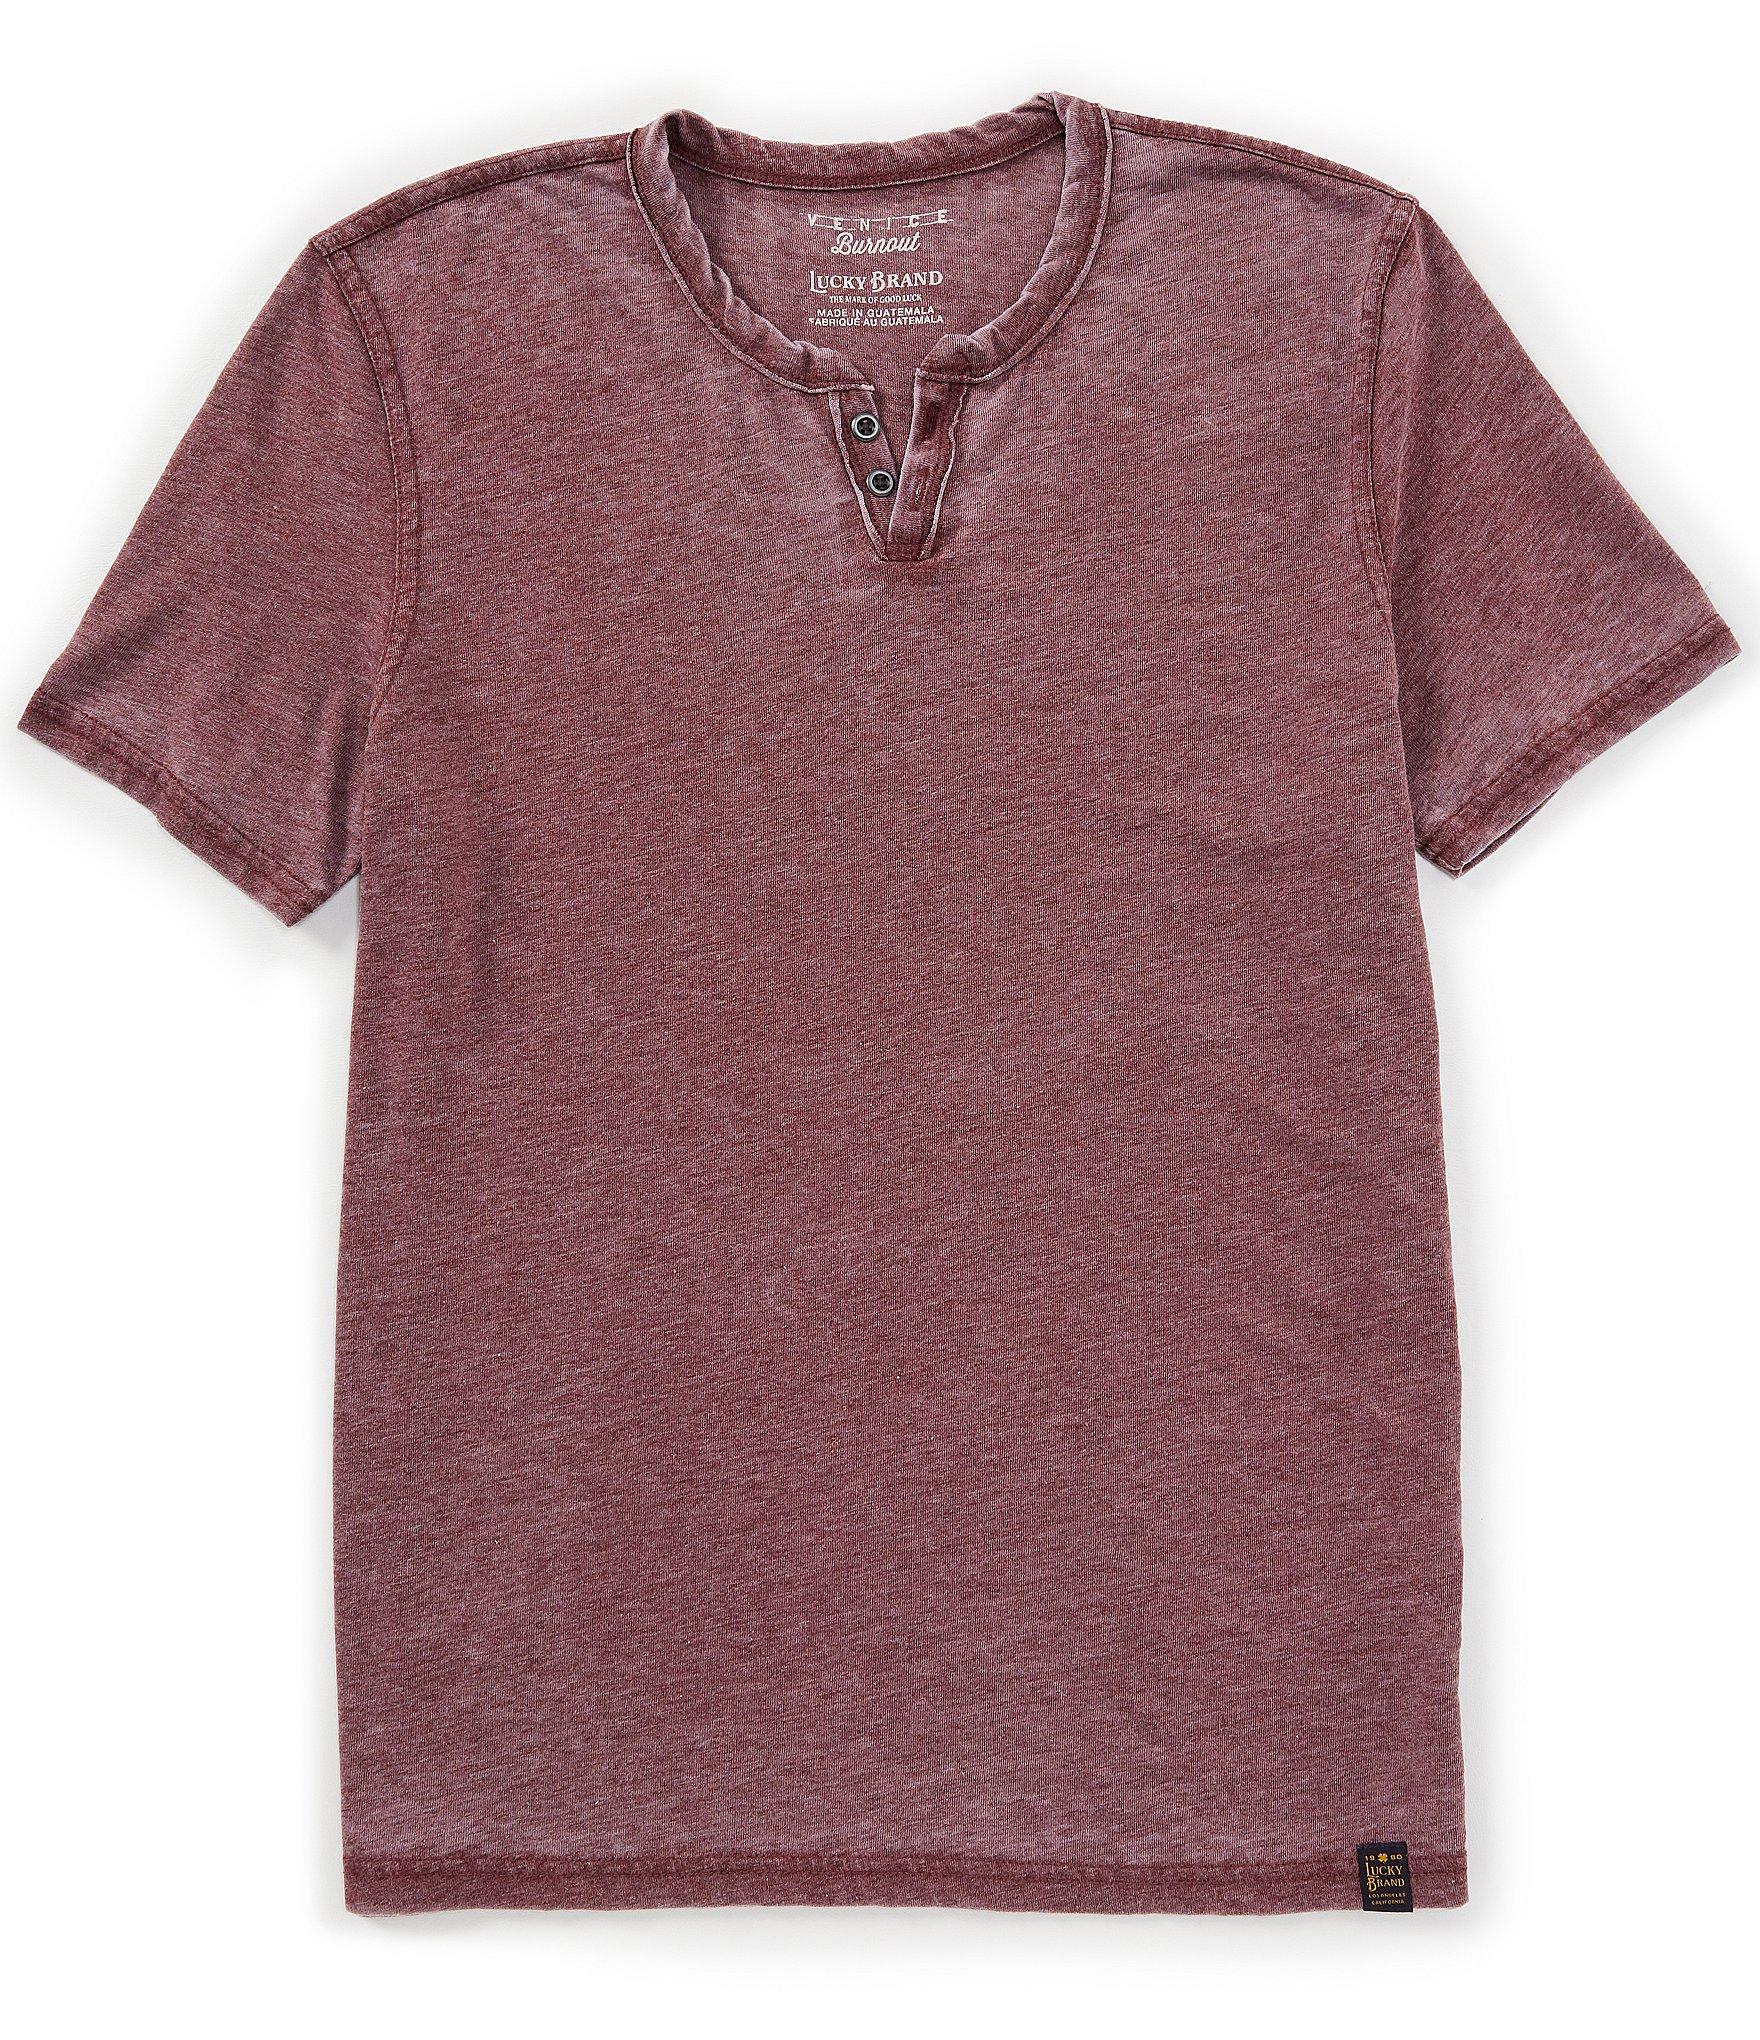 133b28d1 Men's Clothing & Apparel | Dillard's